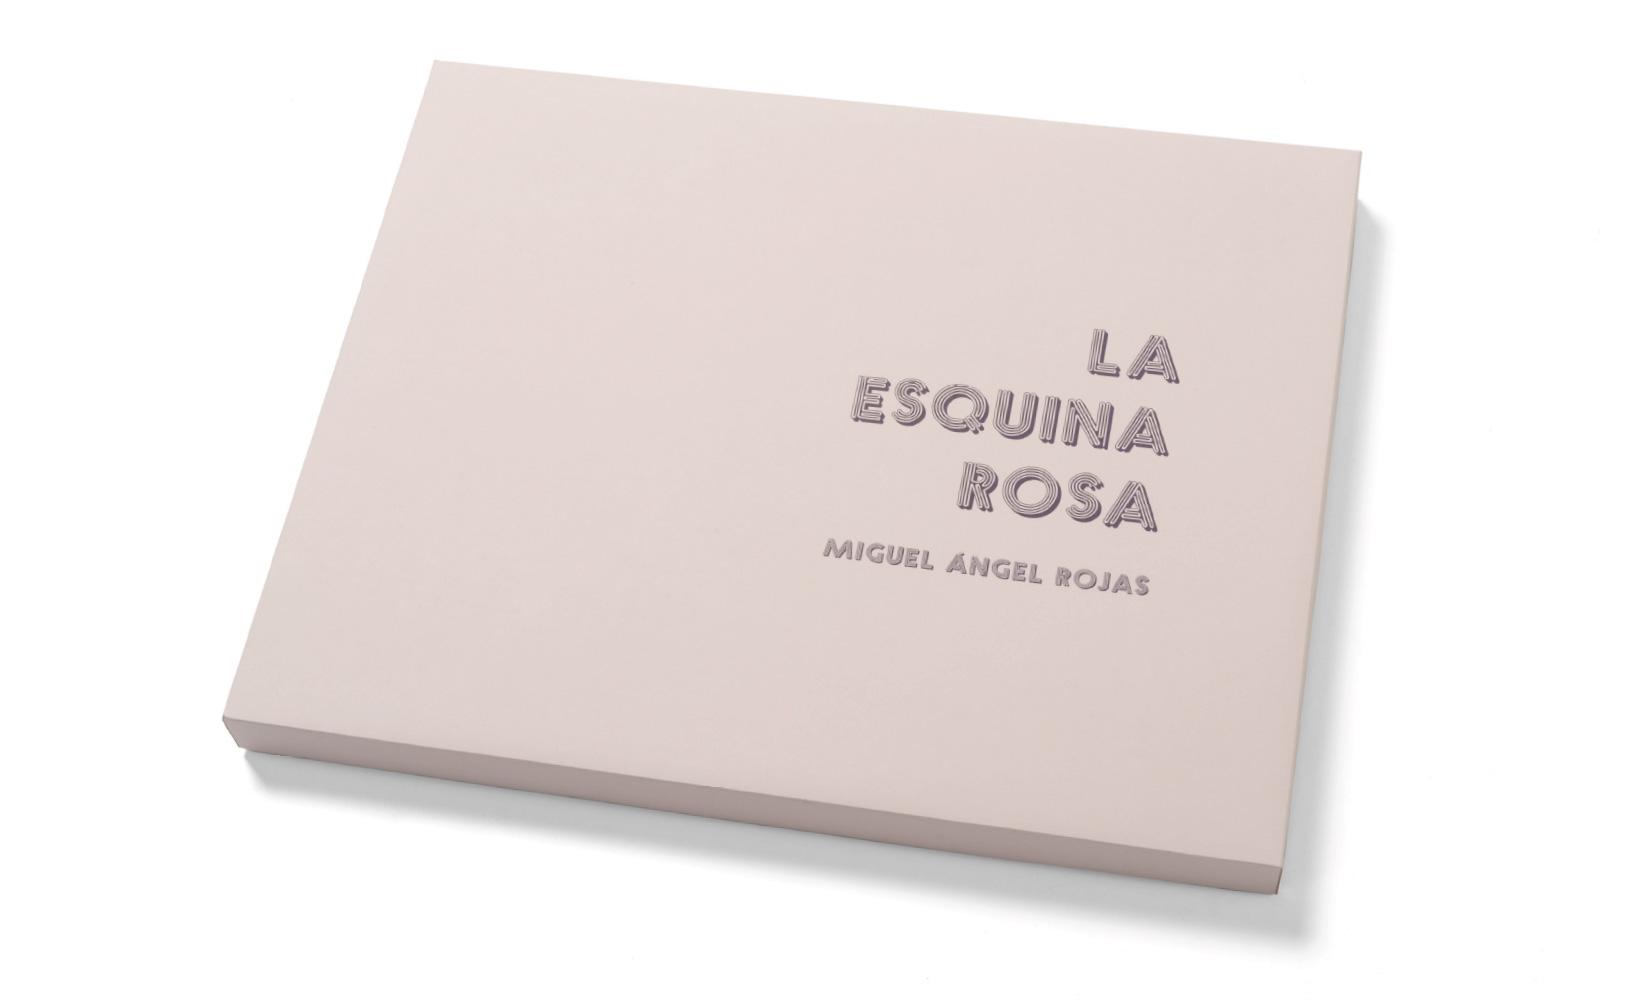 esquina-rose-rojas-toluca-studio-olivier-andreotti-02.jpg